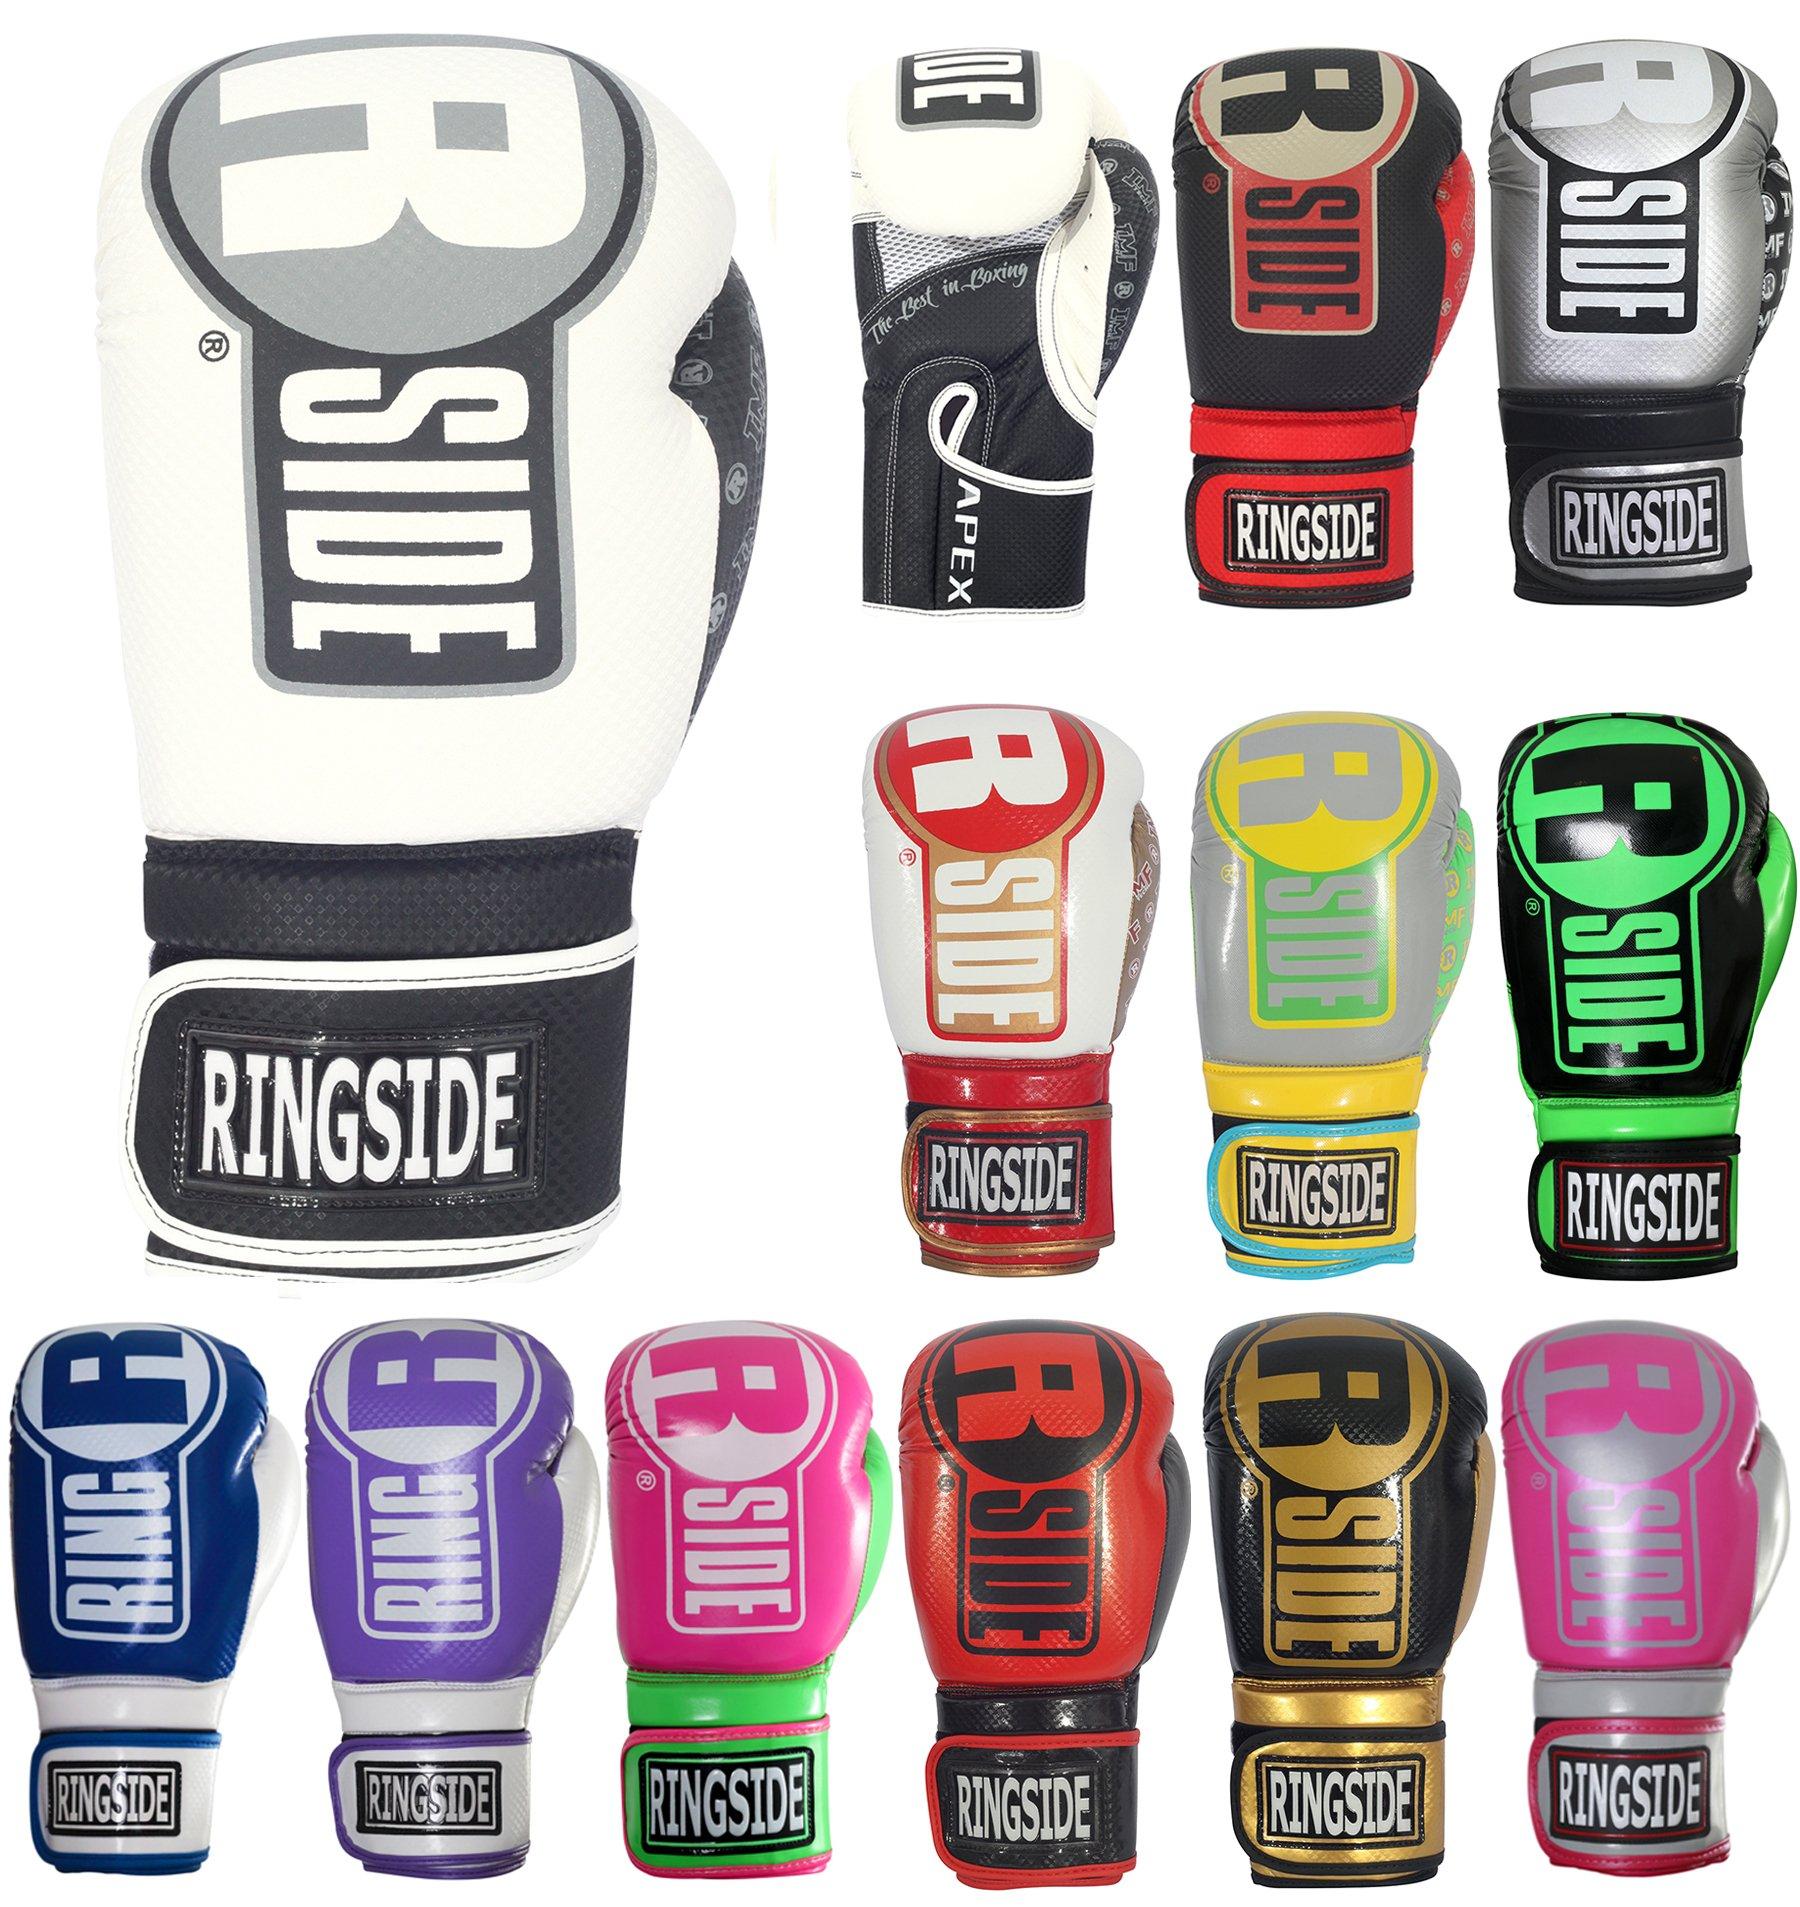 1b8d6d5533 Ringside Apex Bag Gloves - Boxing914.com